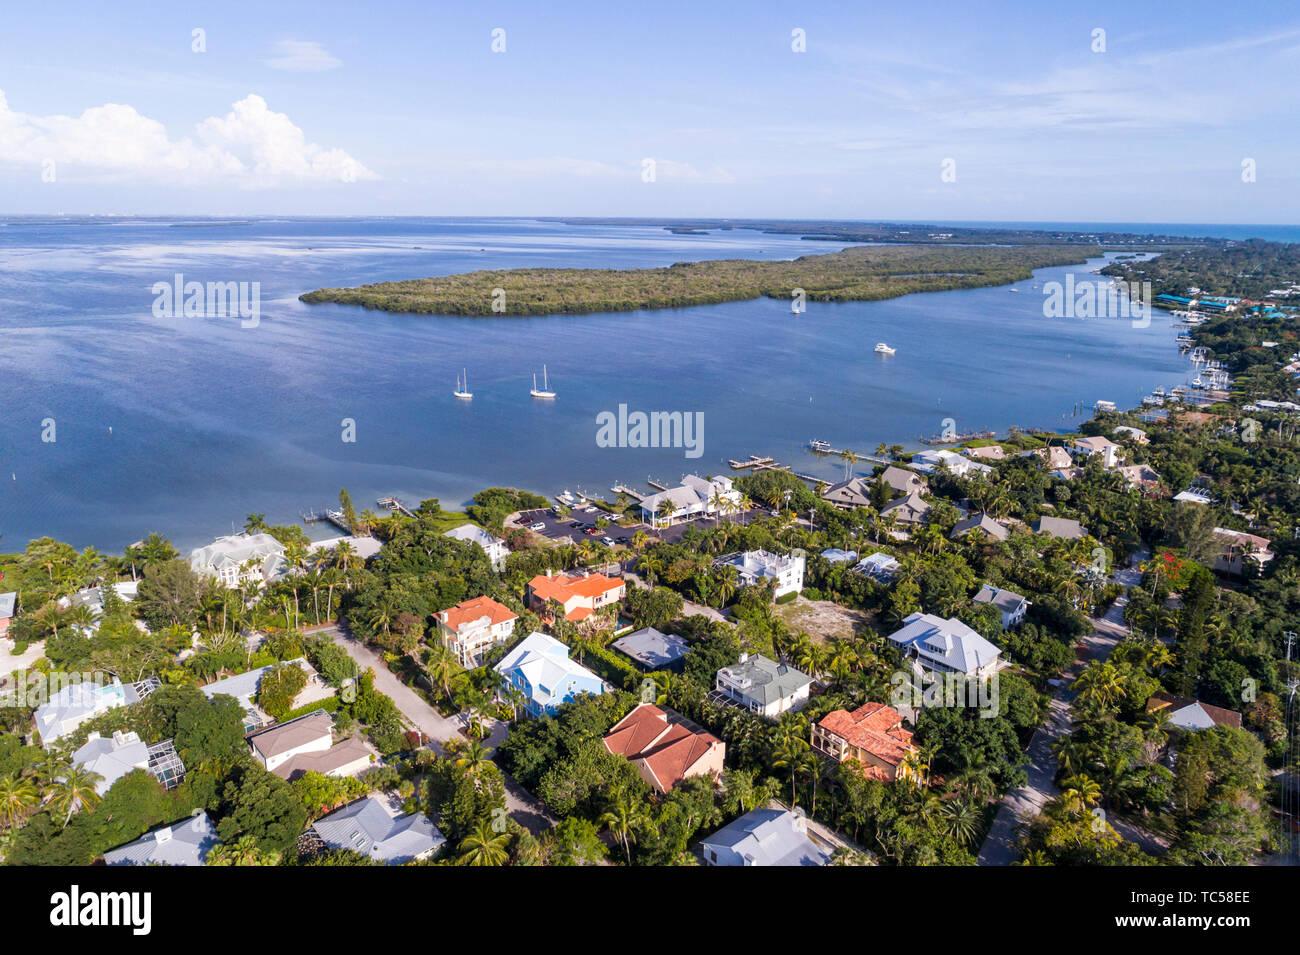 Captiva Island Florida Pine Island Sound Gulf of Mexico Roosevelt Channel Buck Key Preserve homes aerial overhead bird's eye view above Stock Photo